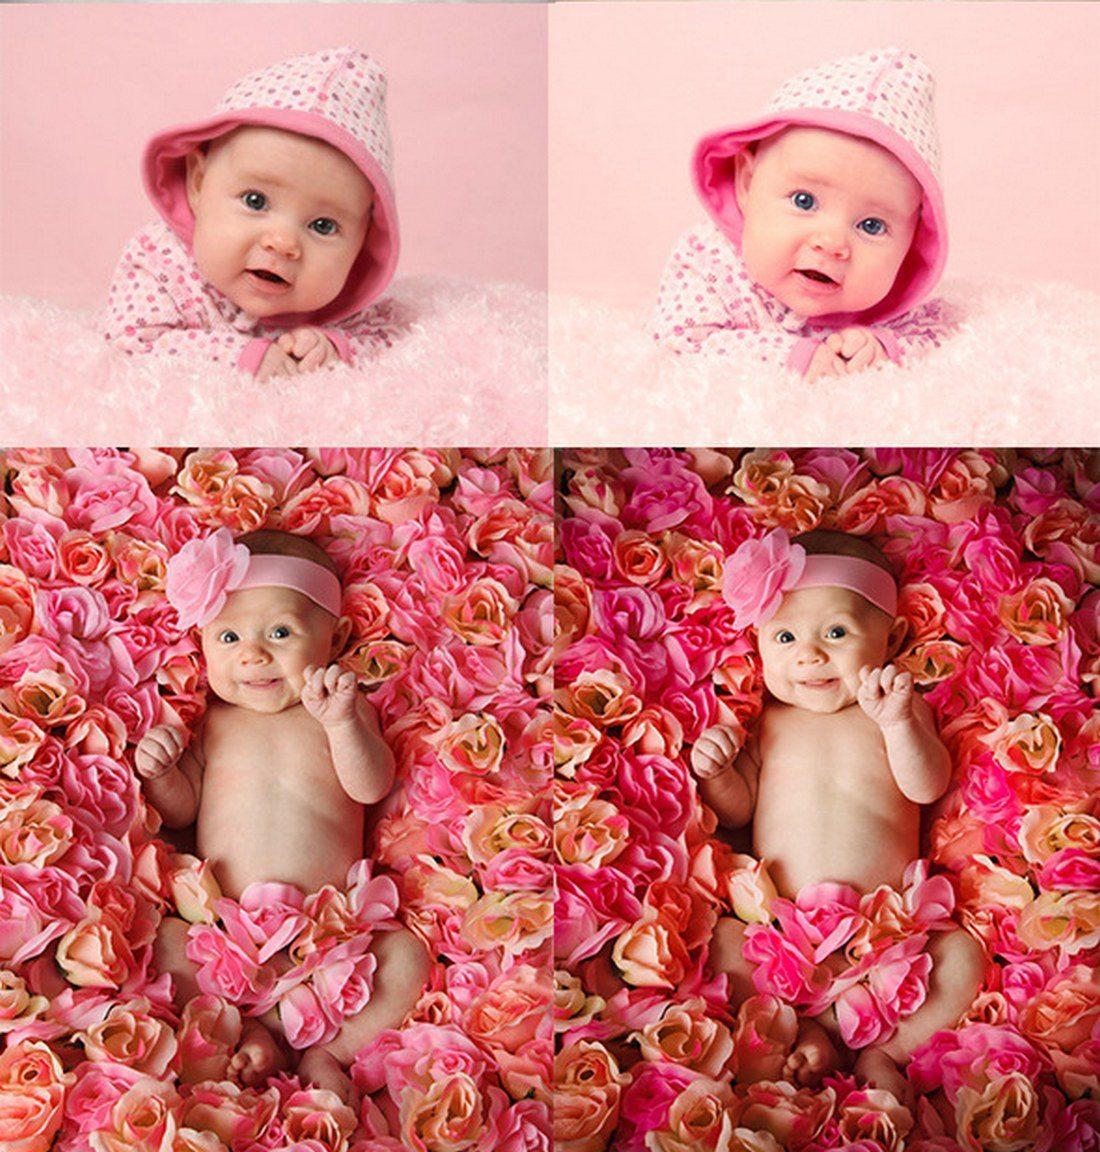 Petite-Lightroom-Presets 20 Best Newborn Lightroom Presets for Baby Photography design tips